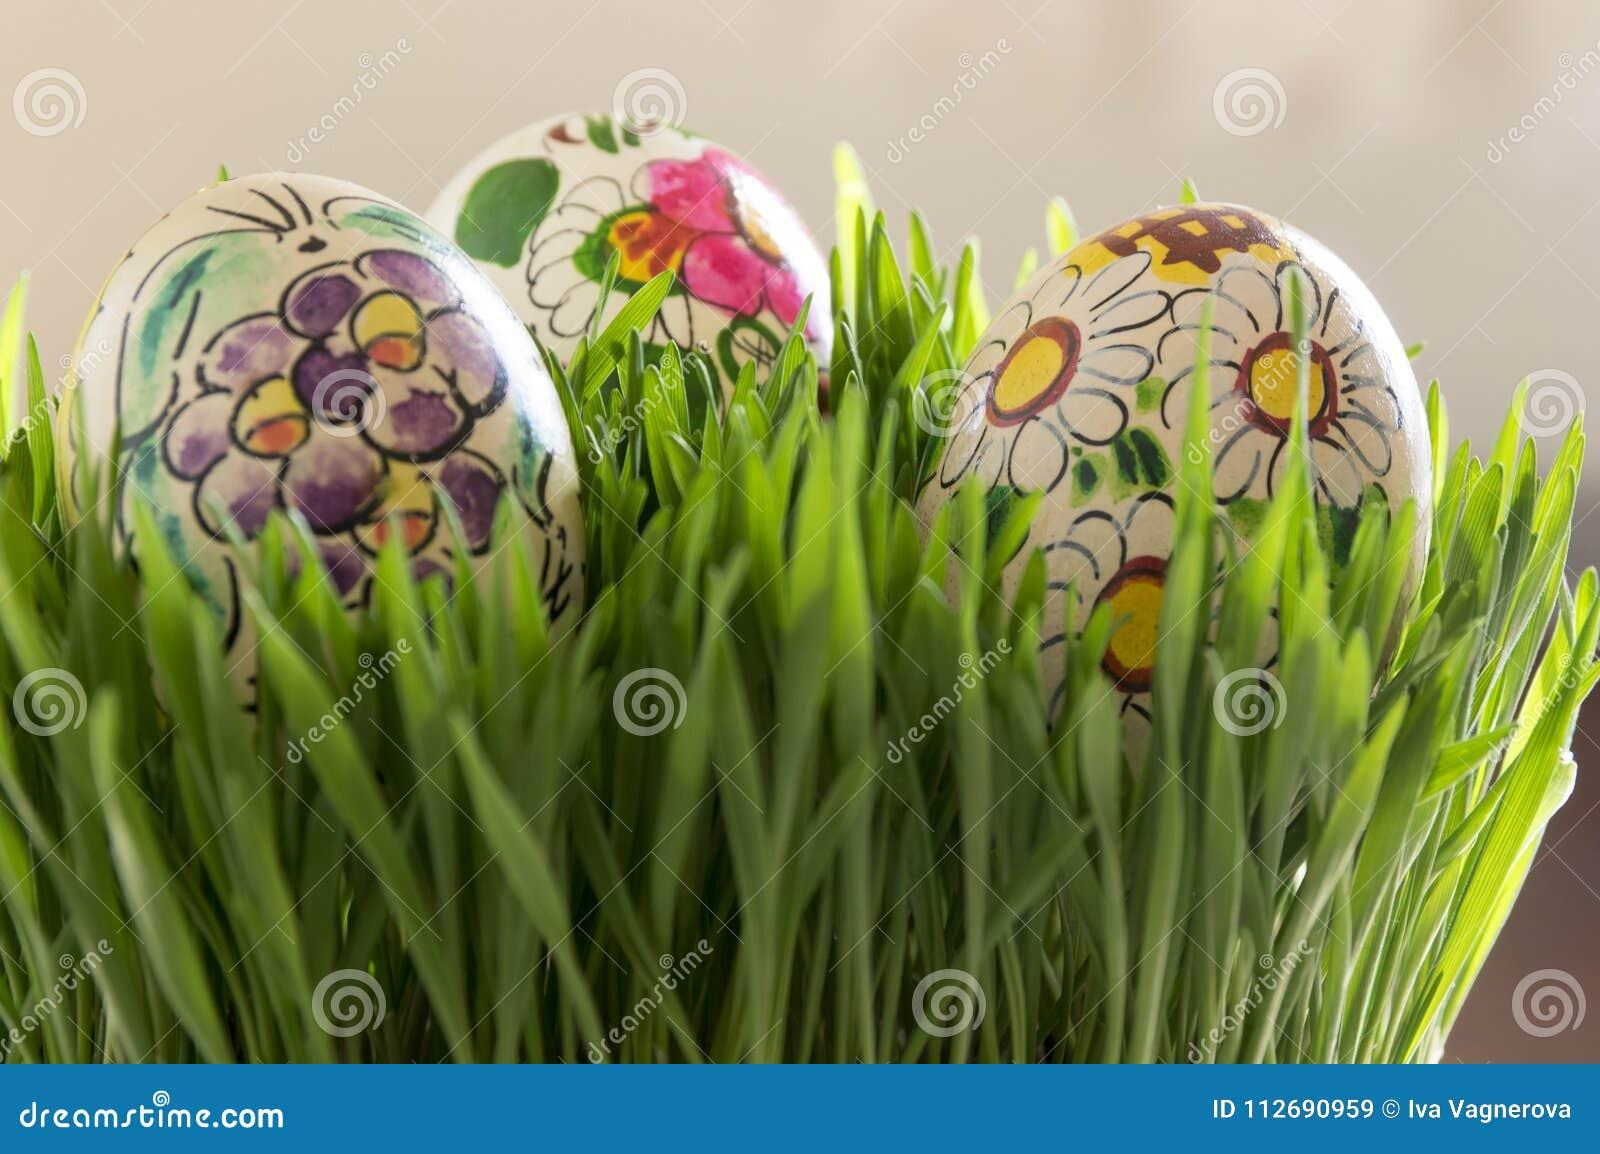 Ovos de Easter na grama verde fresca